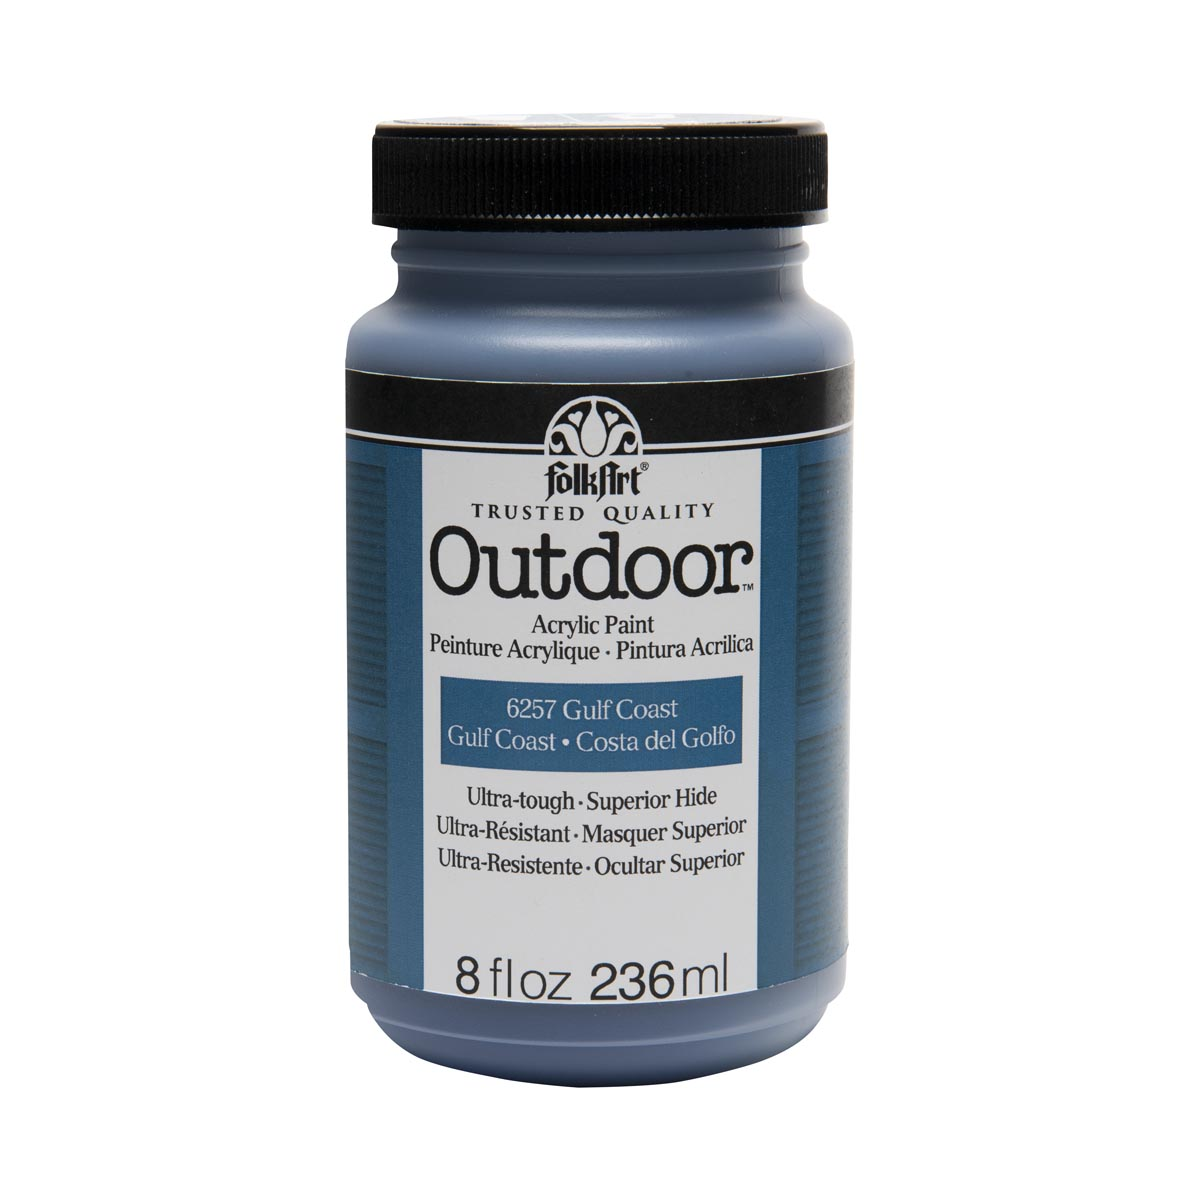 FolkArt ® Outdoor™ Acrylic Colors - Gulf Coast, 8 oz.